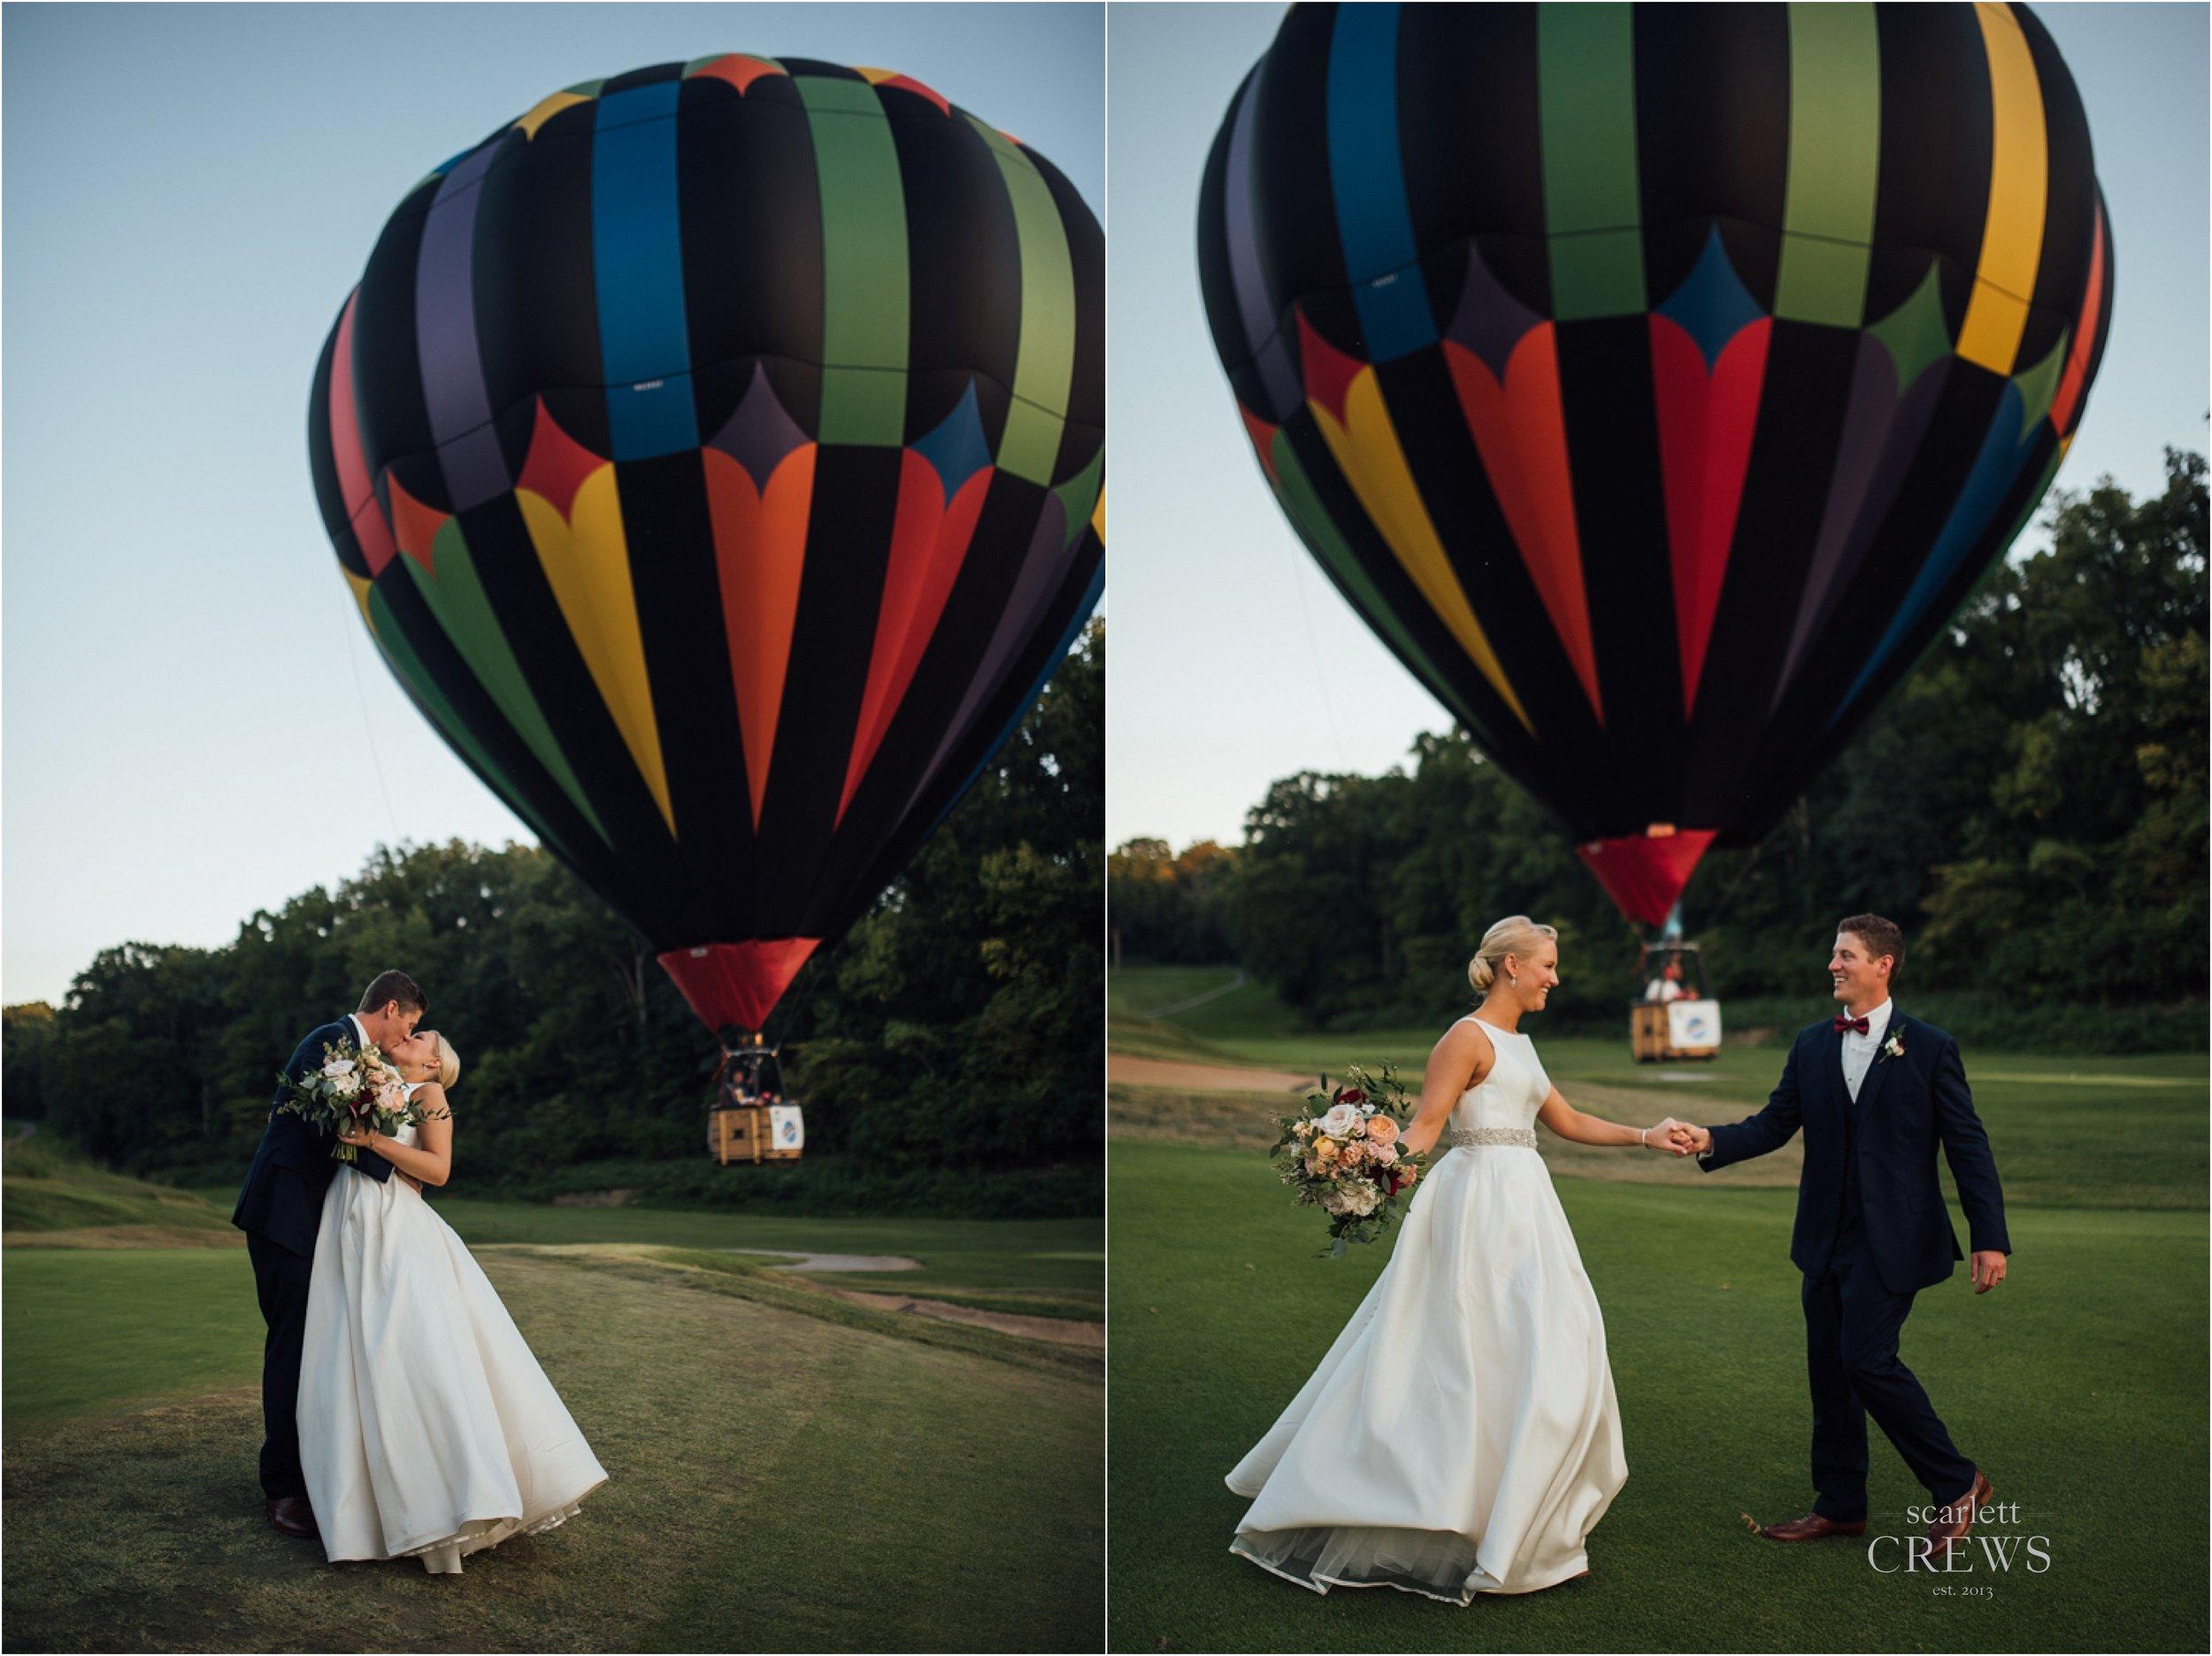 Sunset Country Club Wedding Juliette & Tim50.jpg